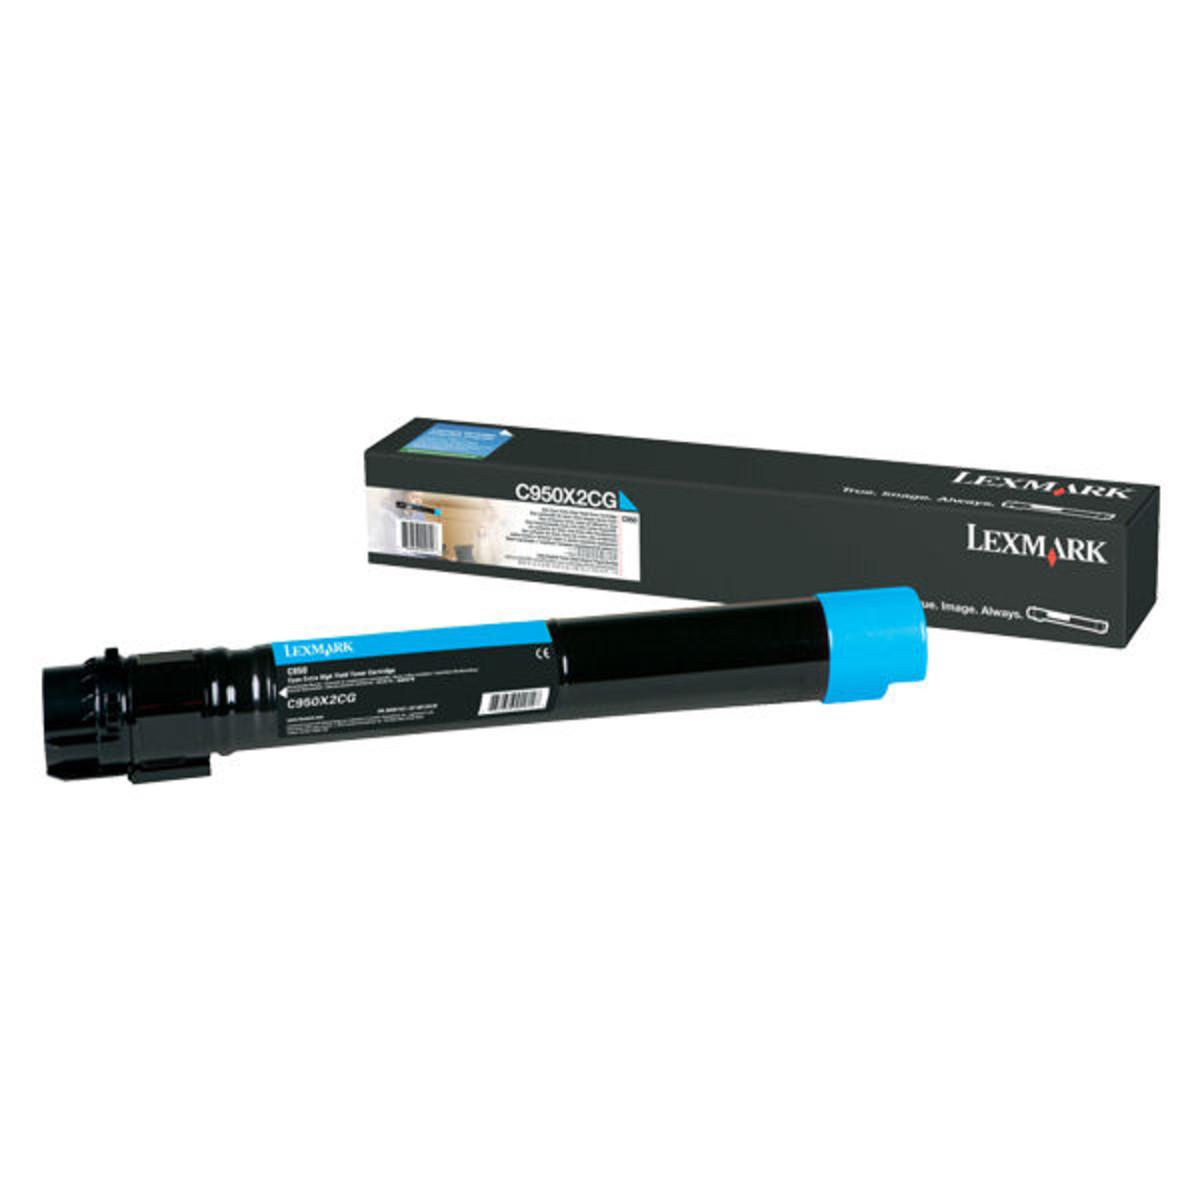 Lexmark C950X2CG Cyan Toner Cartridge